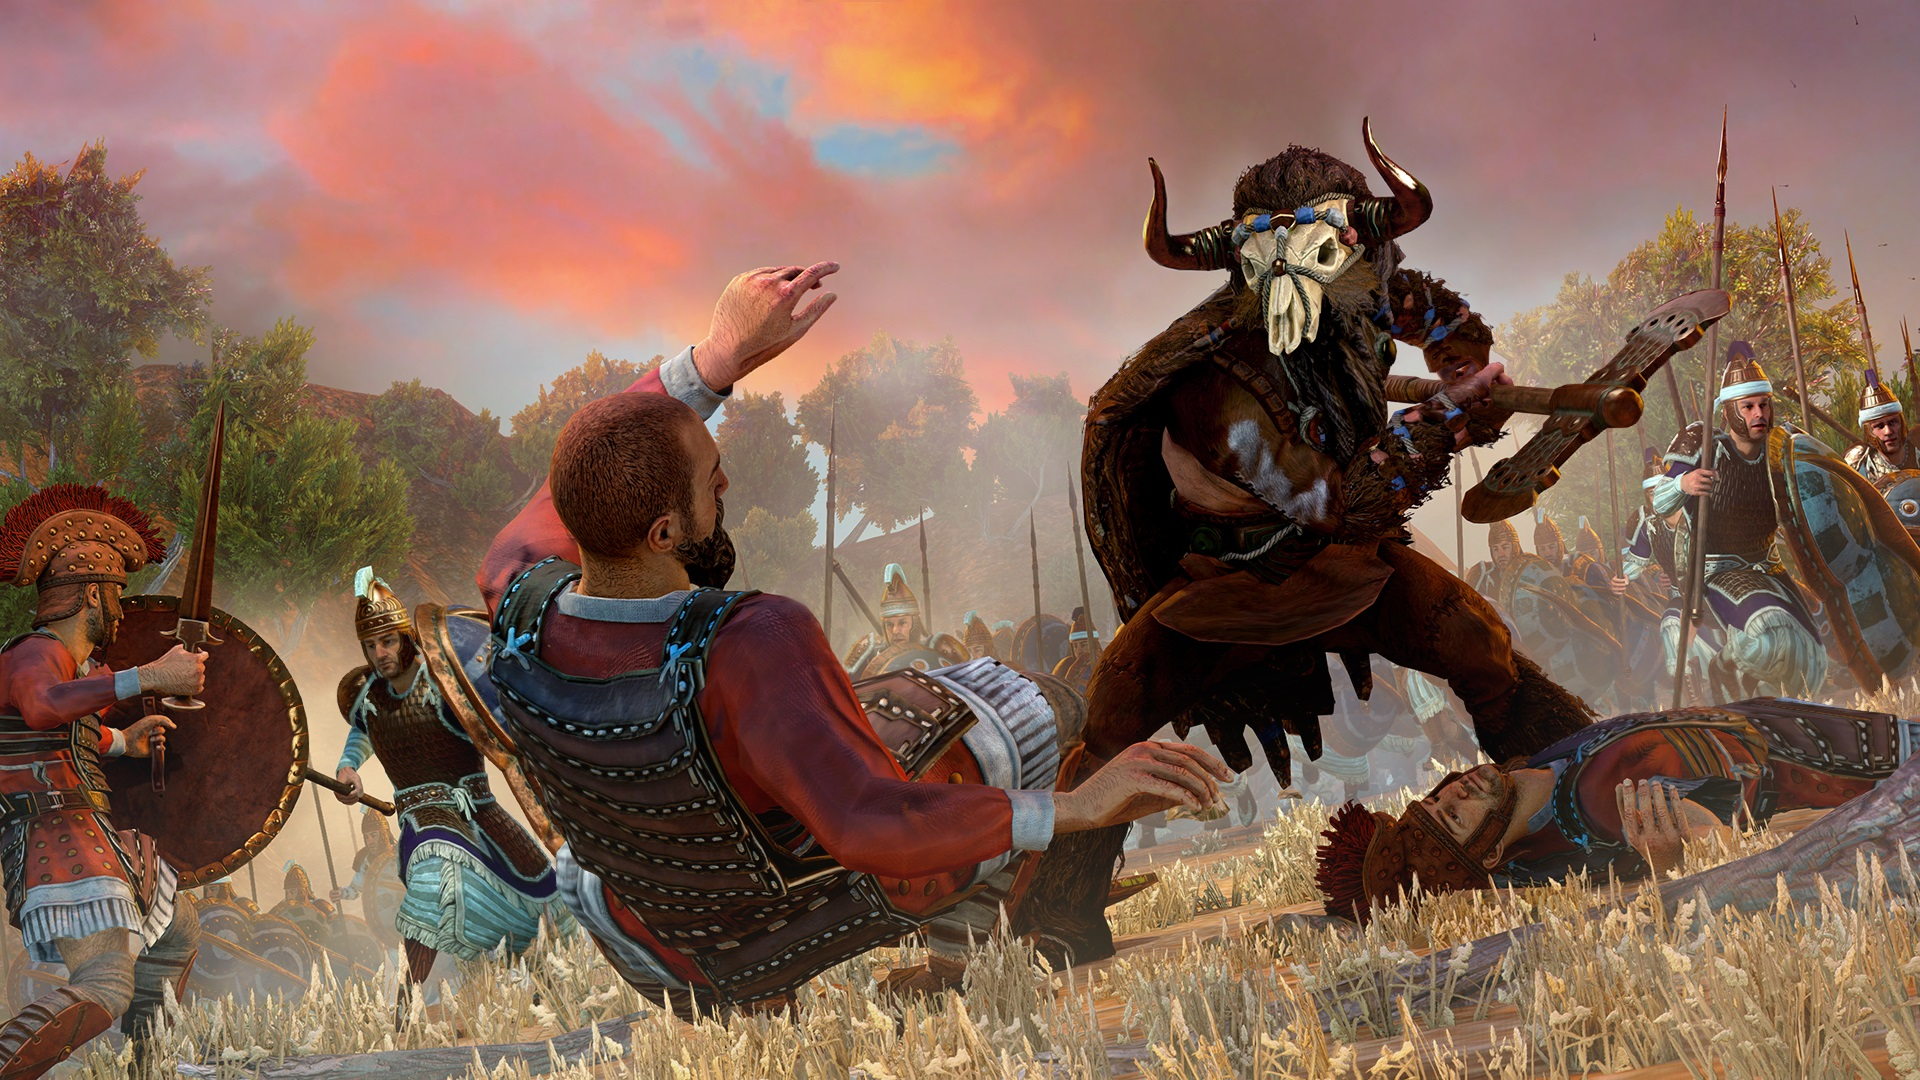 A Total War Saga: Troy در ماه آگوست به فروشگاه Epic Games می آید